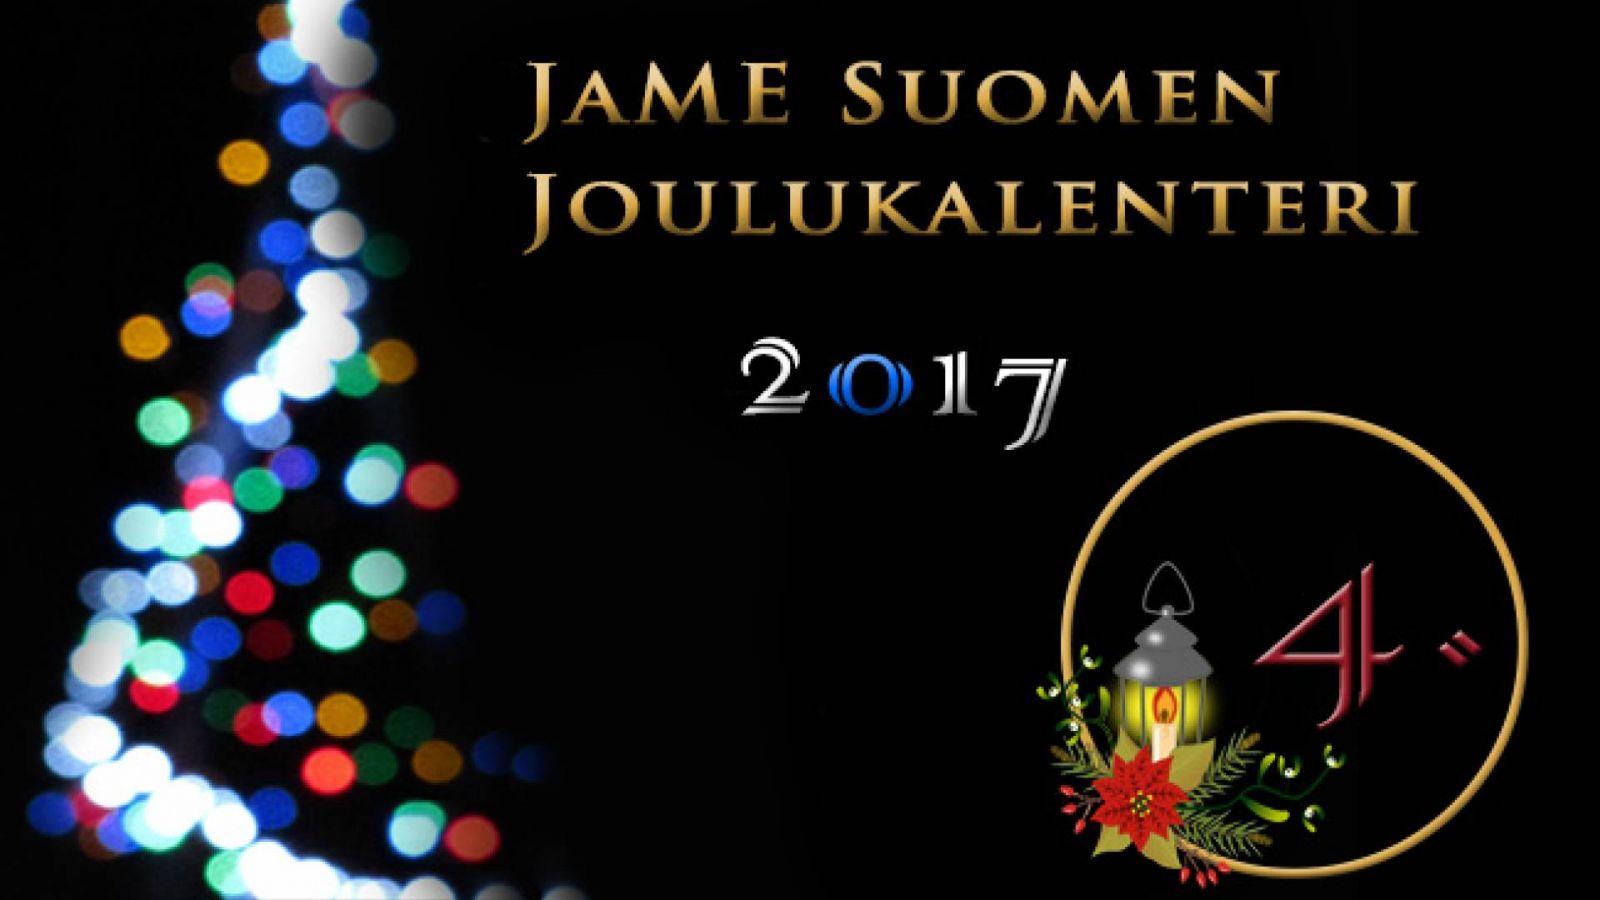 JaME Suomen joulukalenterin 4. luukku © Nipsu